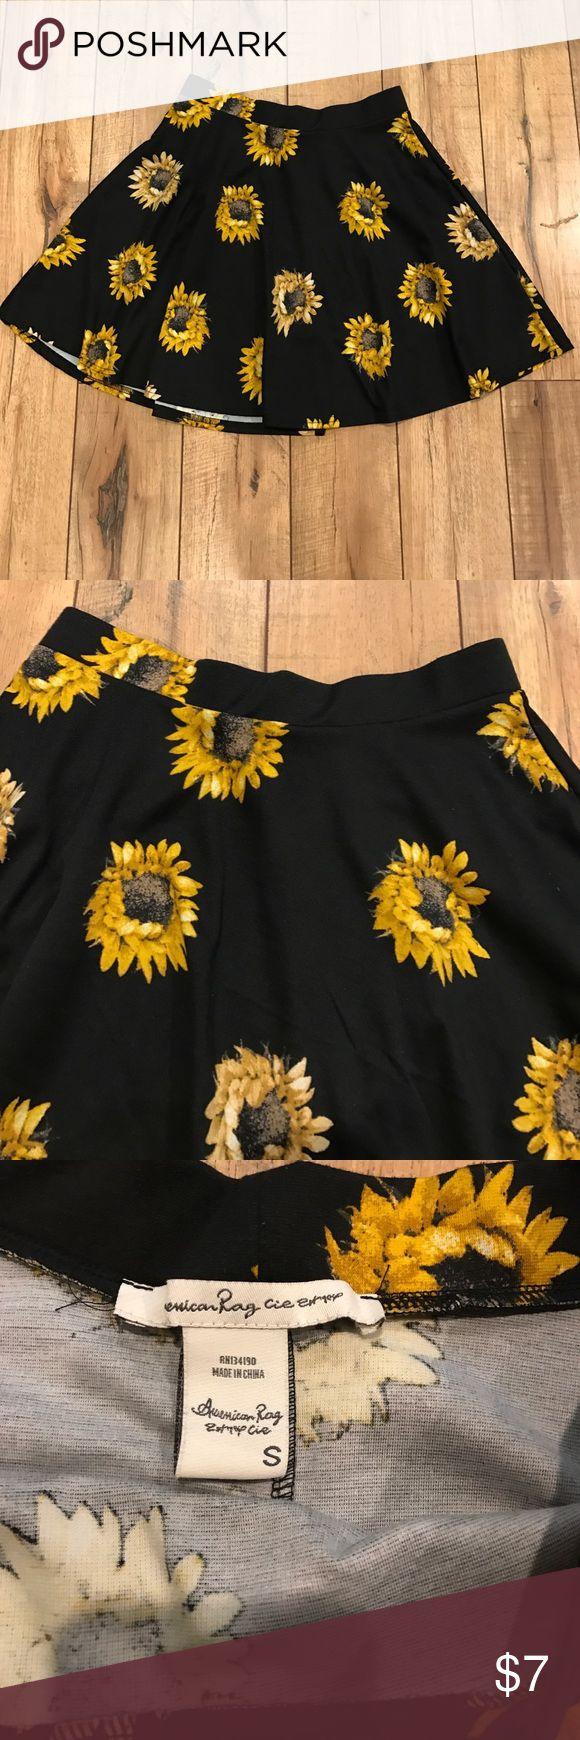 American Rag sunflower skirt American Rag skirt. Worn a few times. Size Small American Rag Skirts